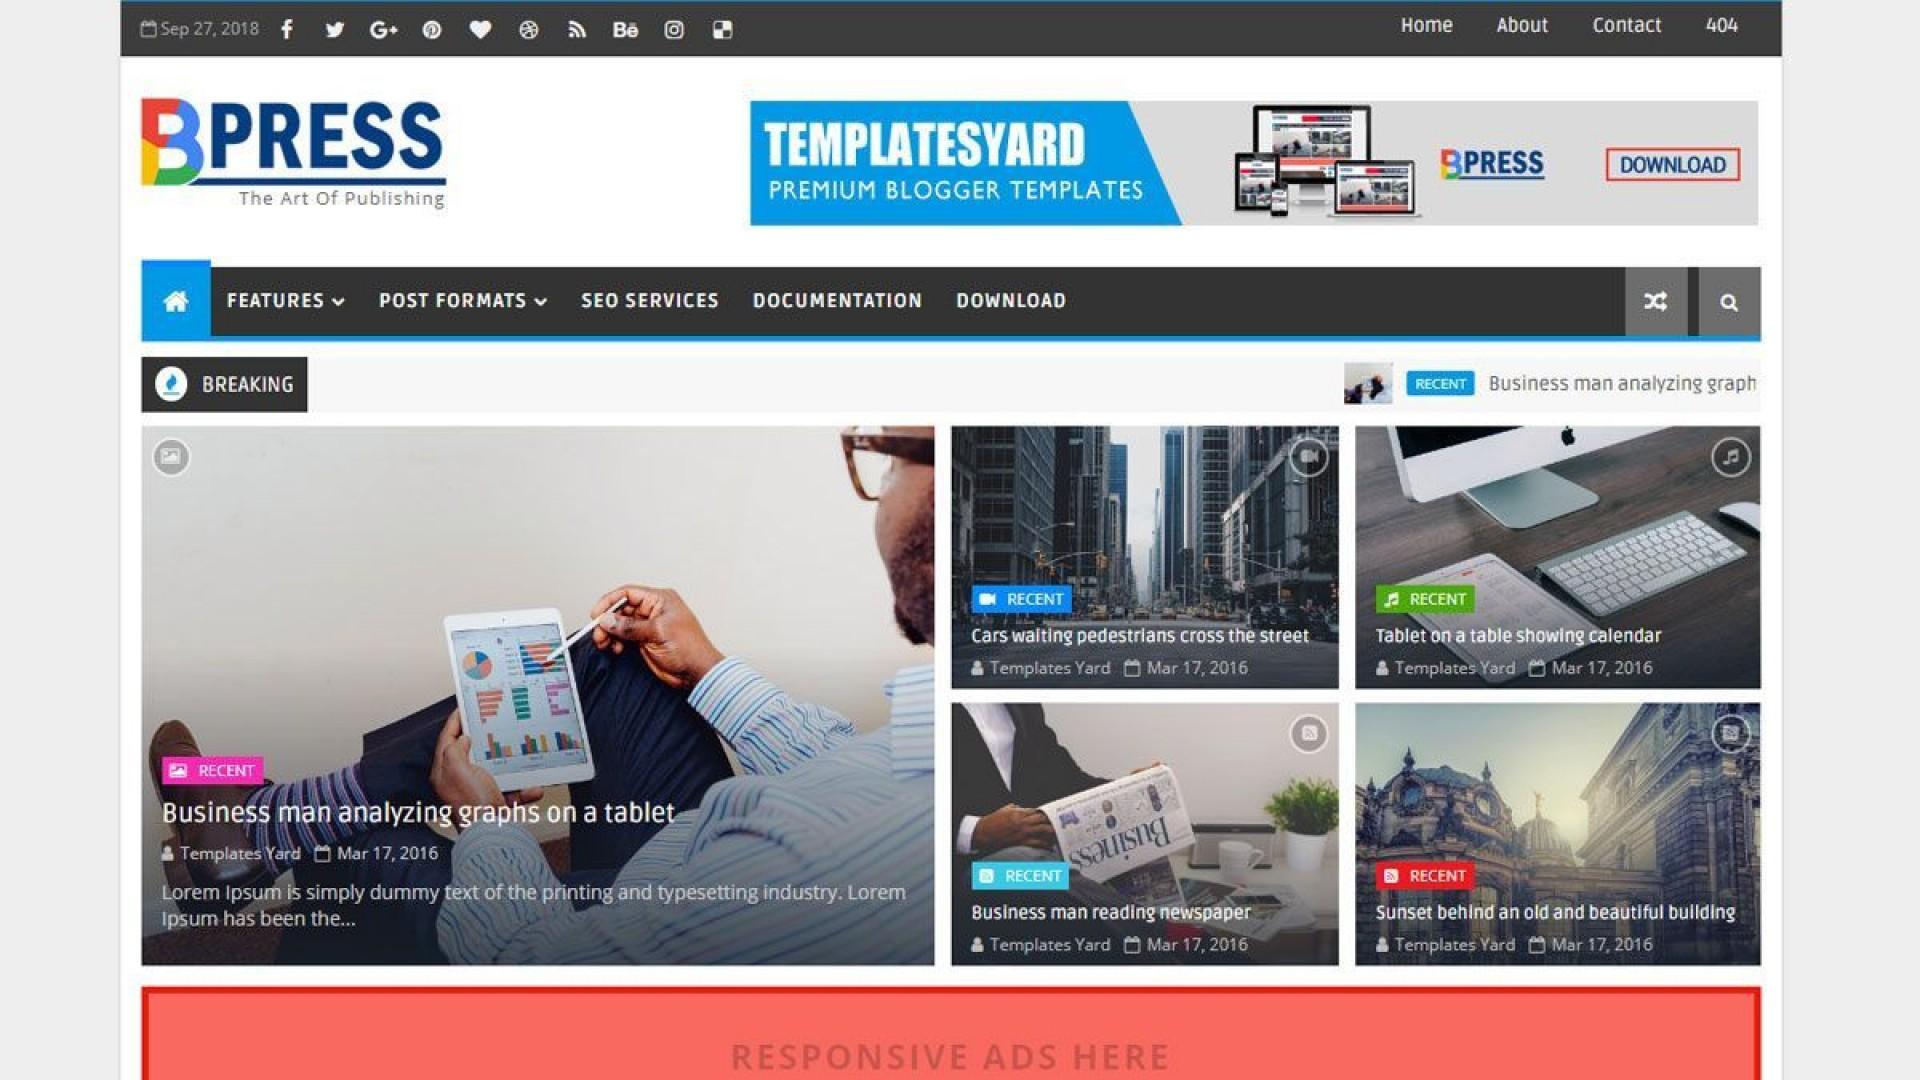 001 Stupendou Free Responsive Blogger Template Design  2019 Top Mobile Friendly1920